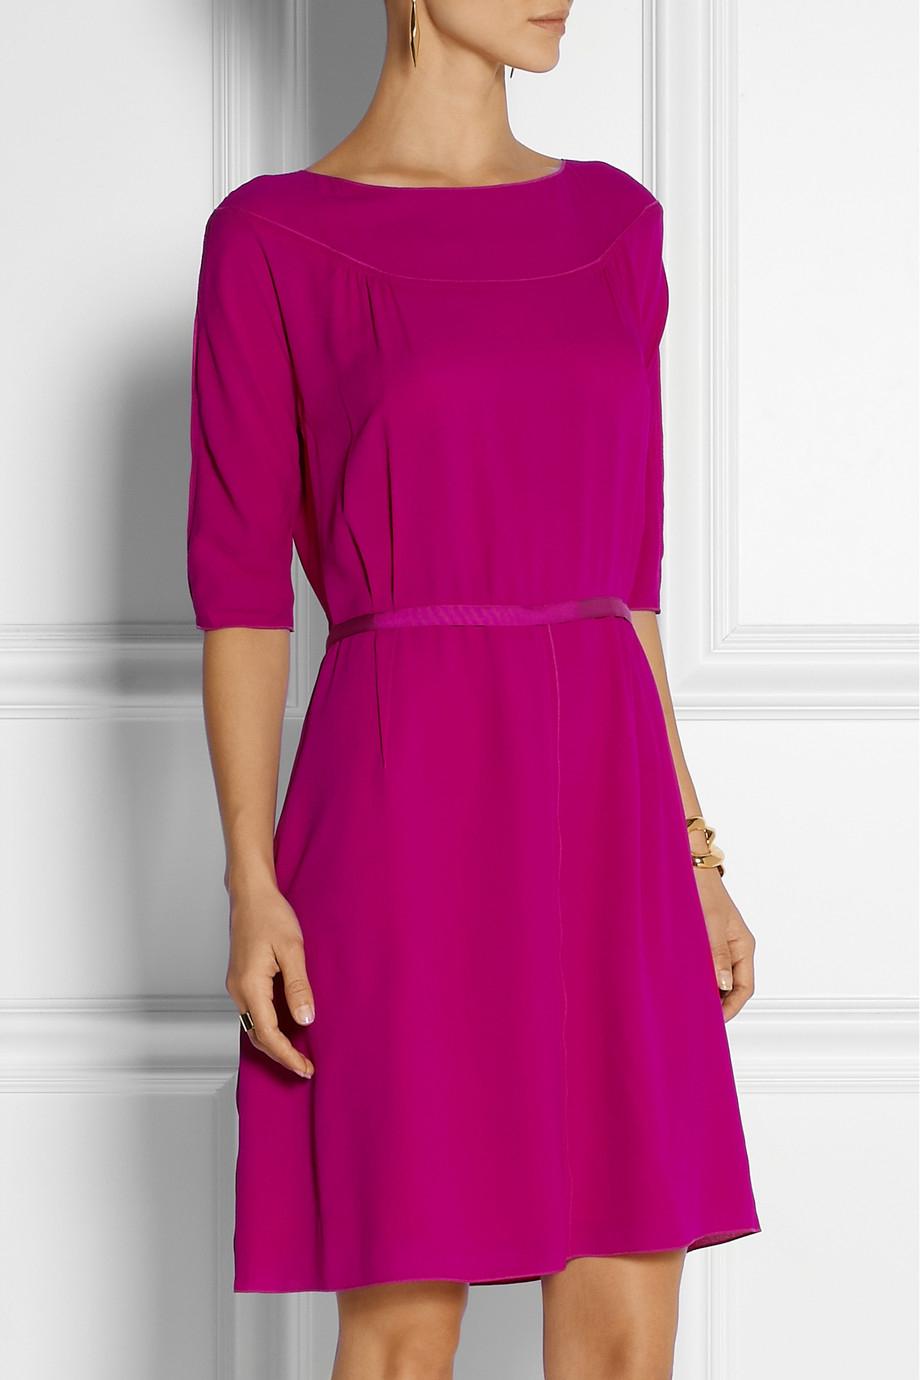 lyst nina ricci silk crepe de chine dress in purple. Black Bedroom Furniture Sets. Home Design Ideas